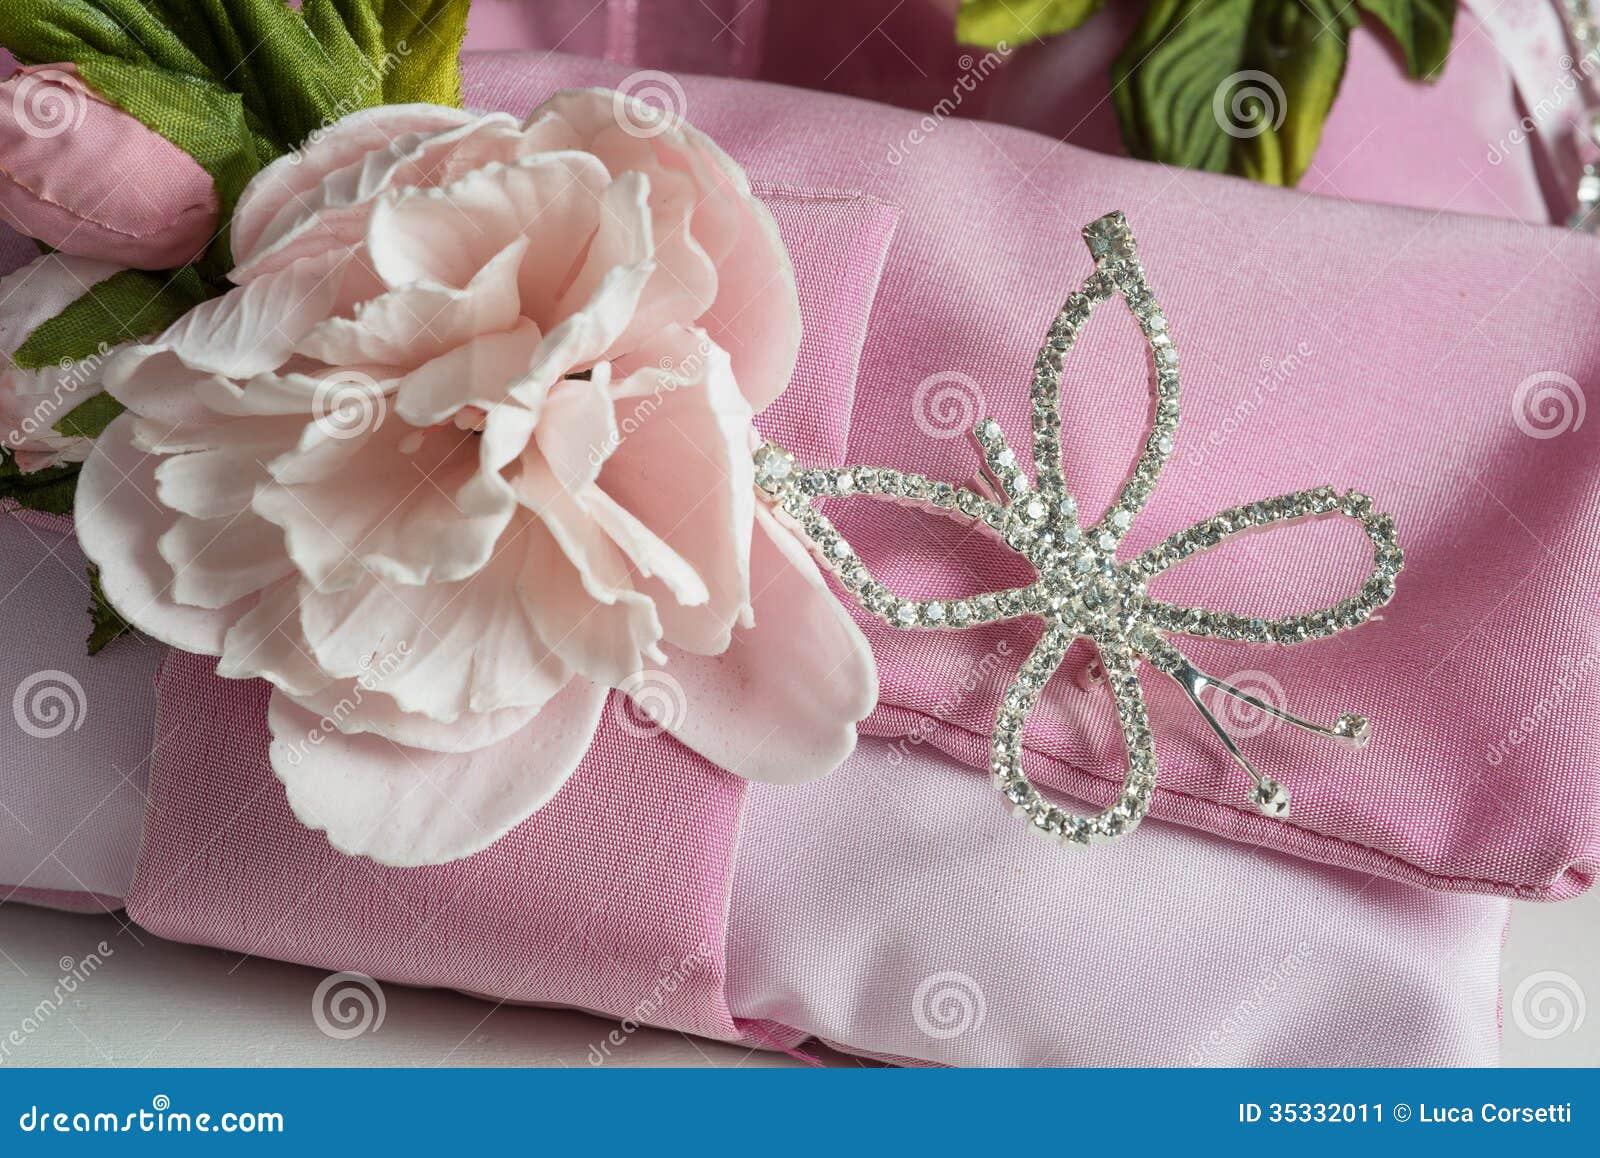 Favors - Bomboniere stock image. Image of table, ribbon - 35332011